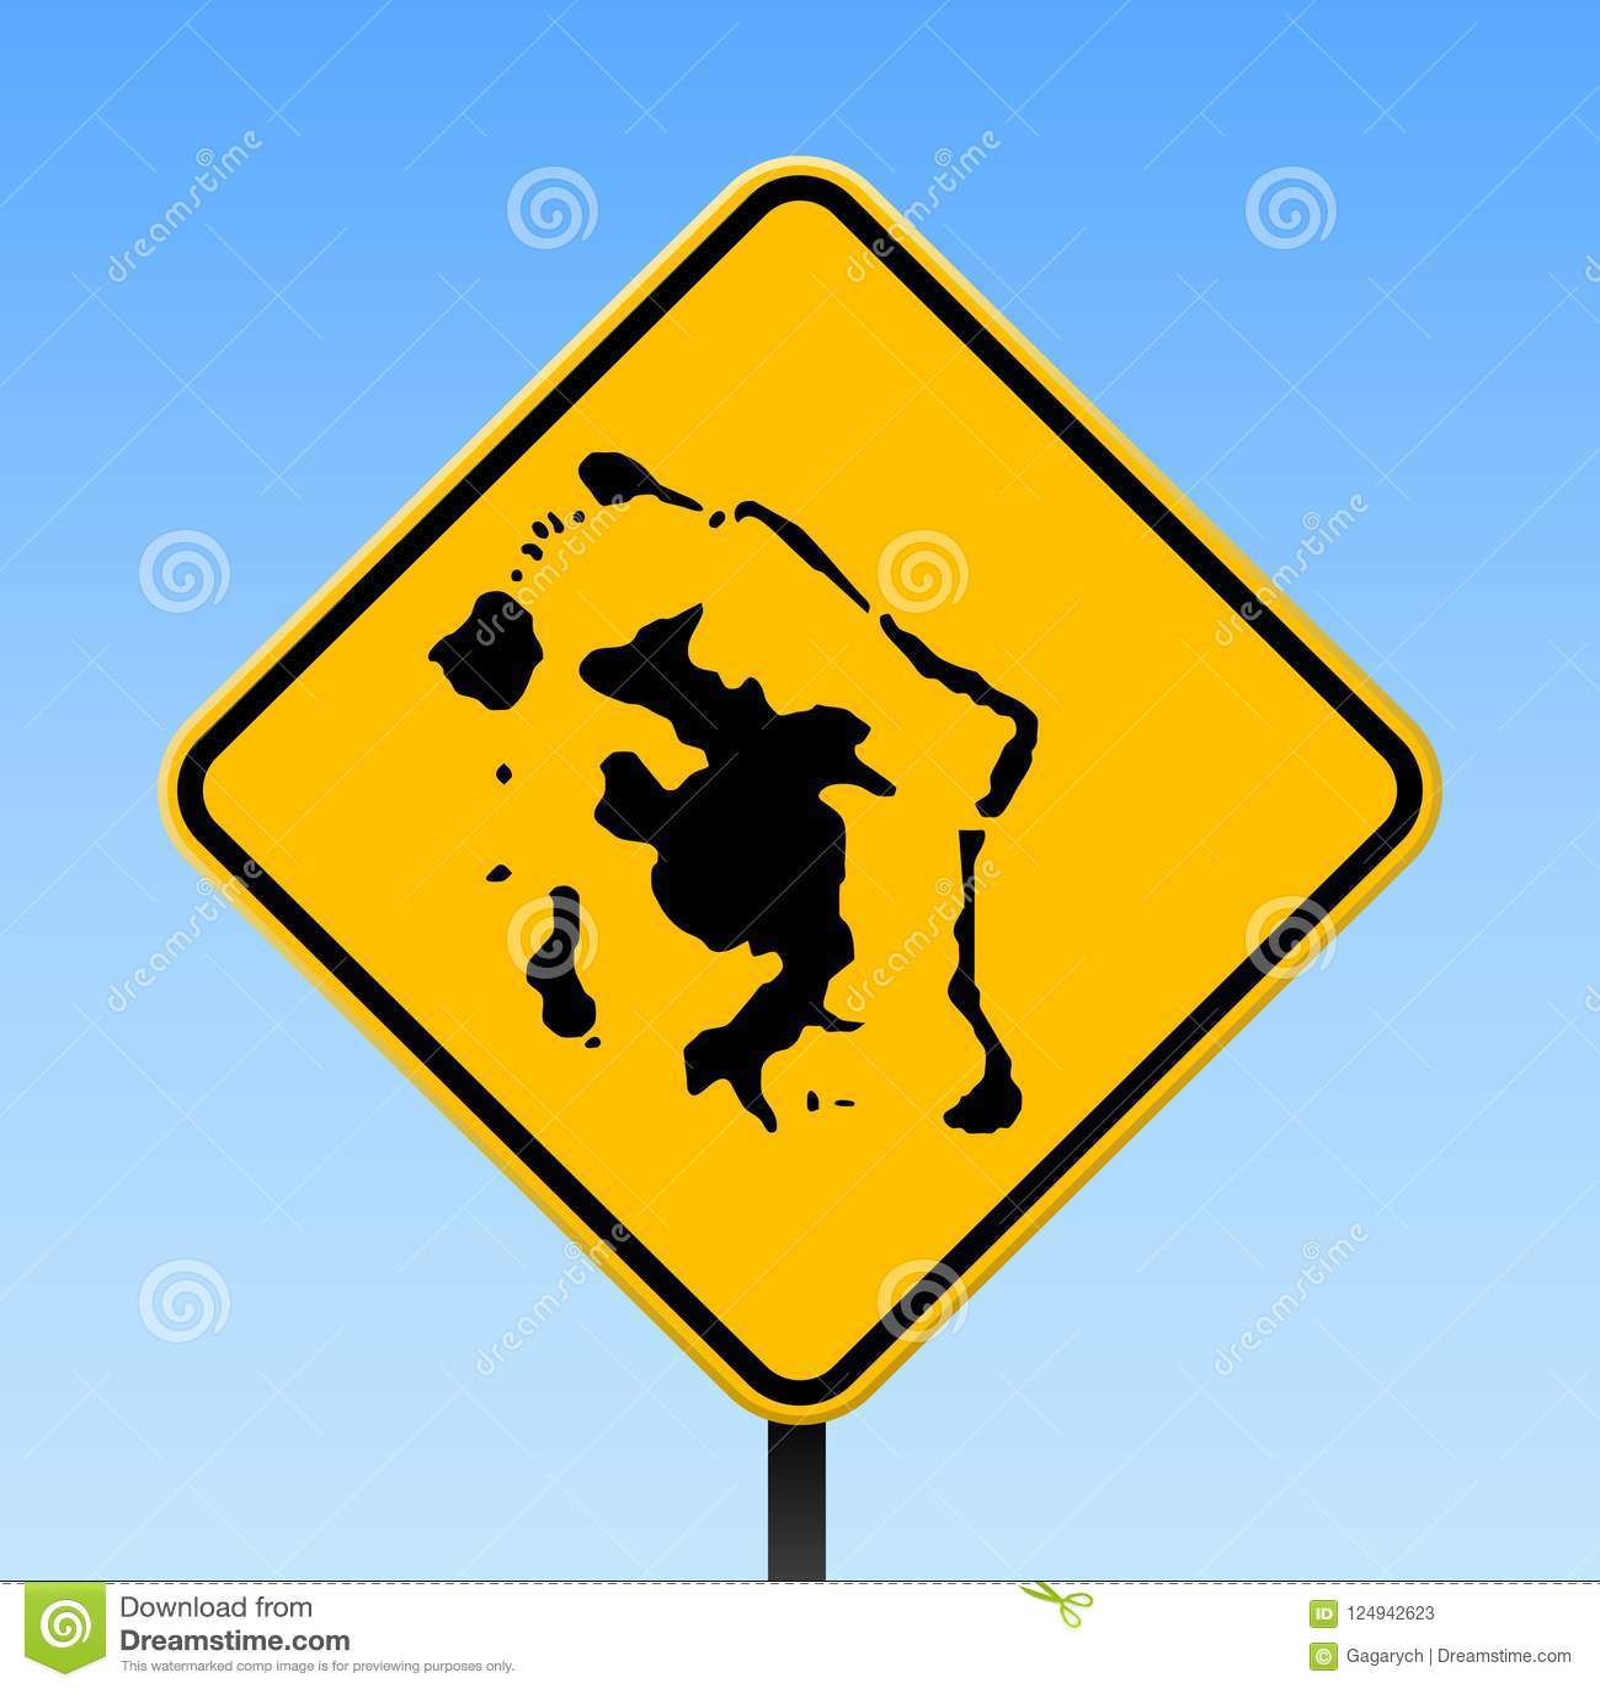 Bora Bora Map On Road Sign Stock Vector Illustration Of